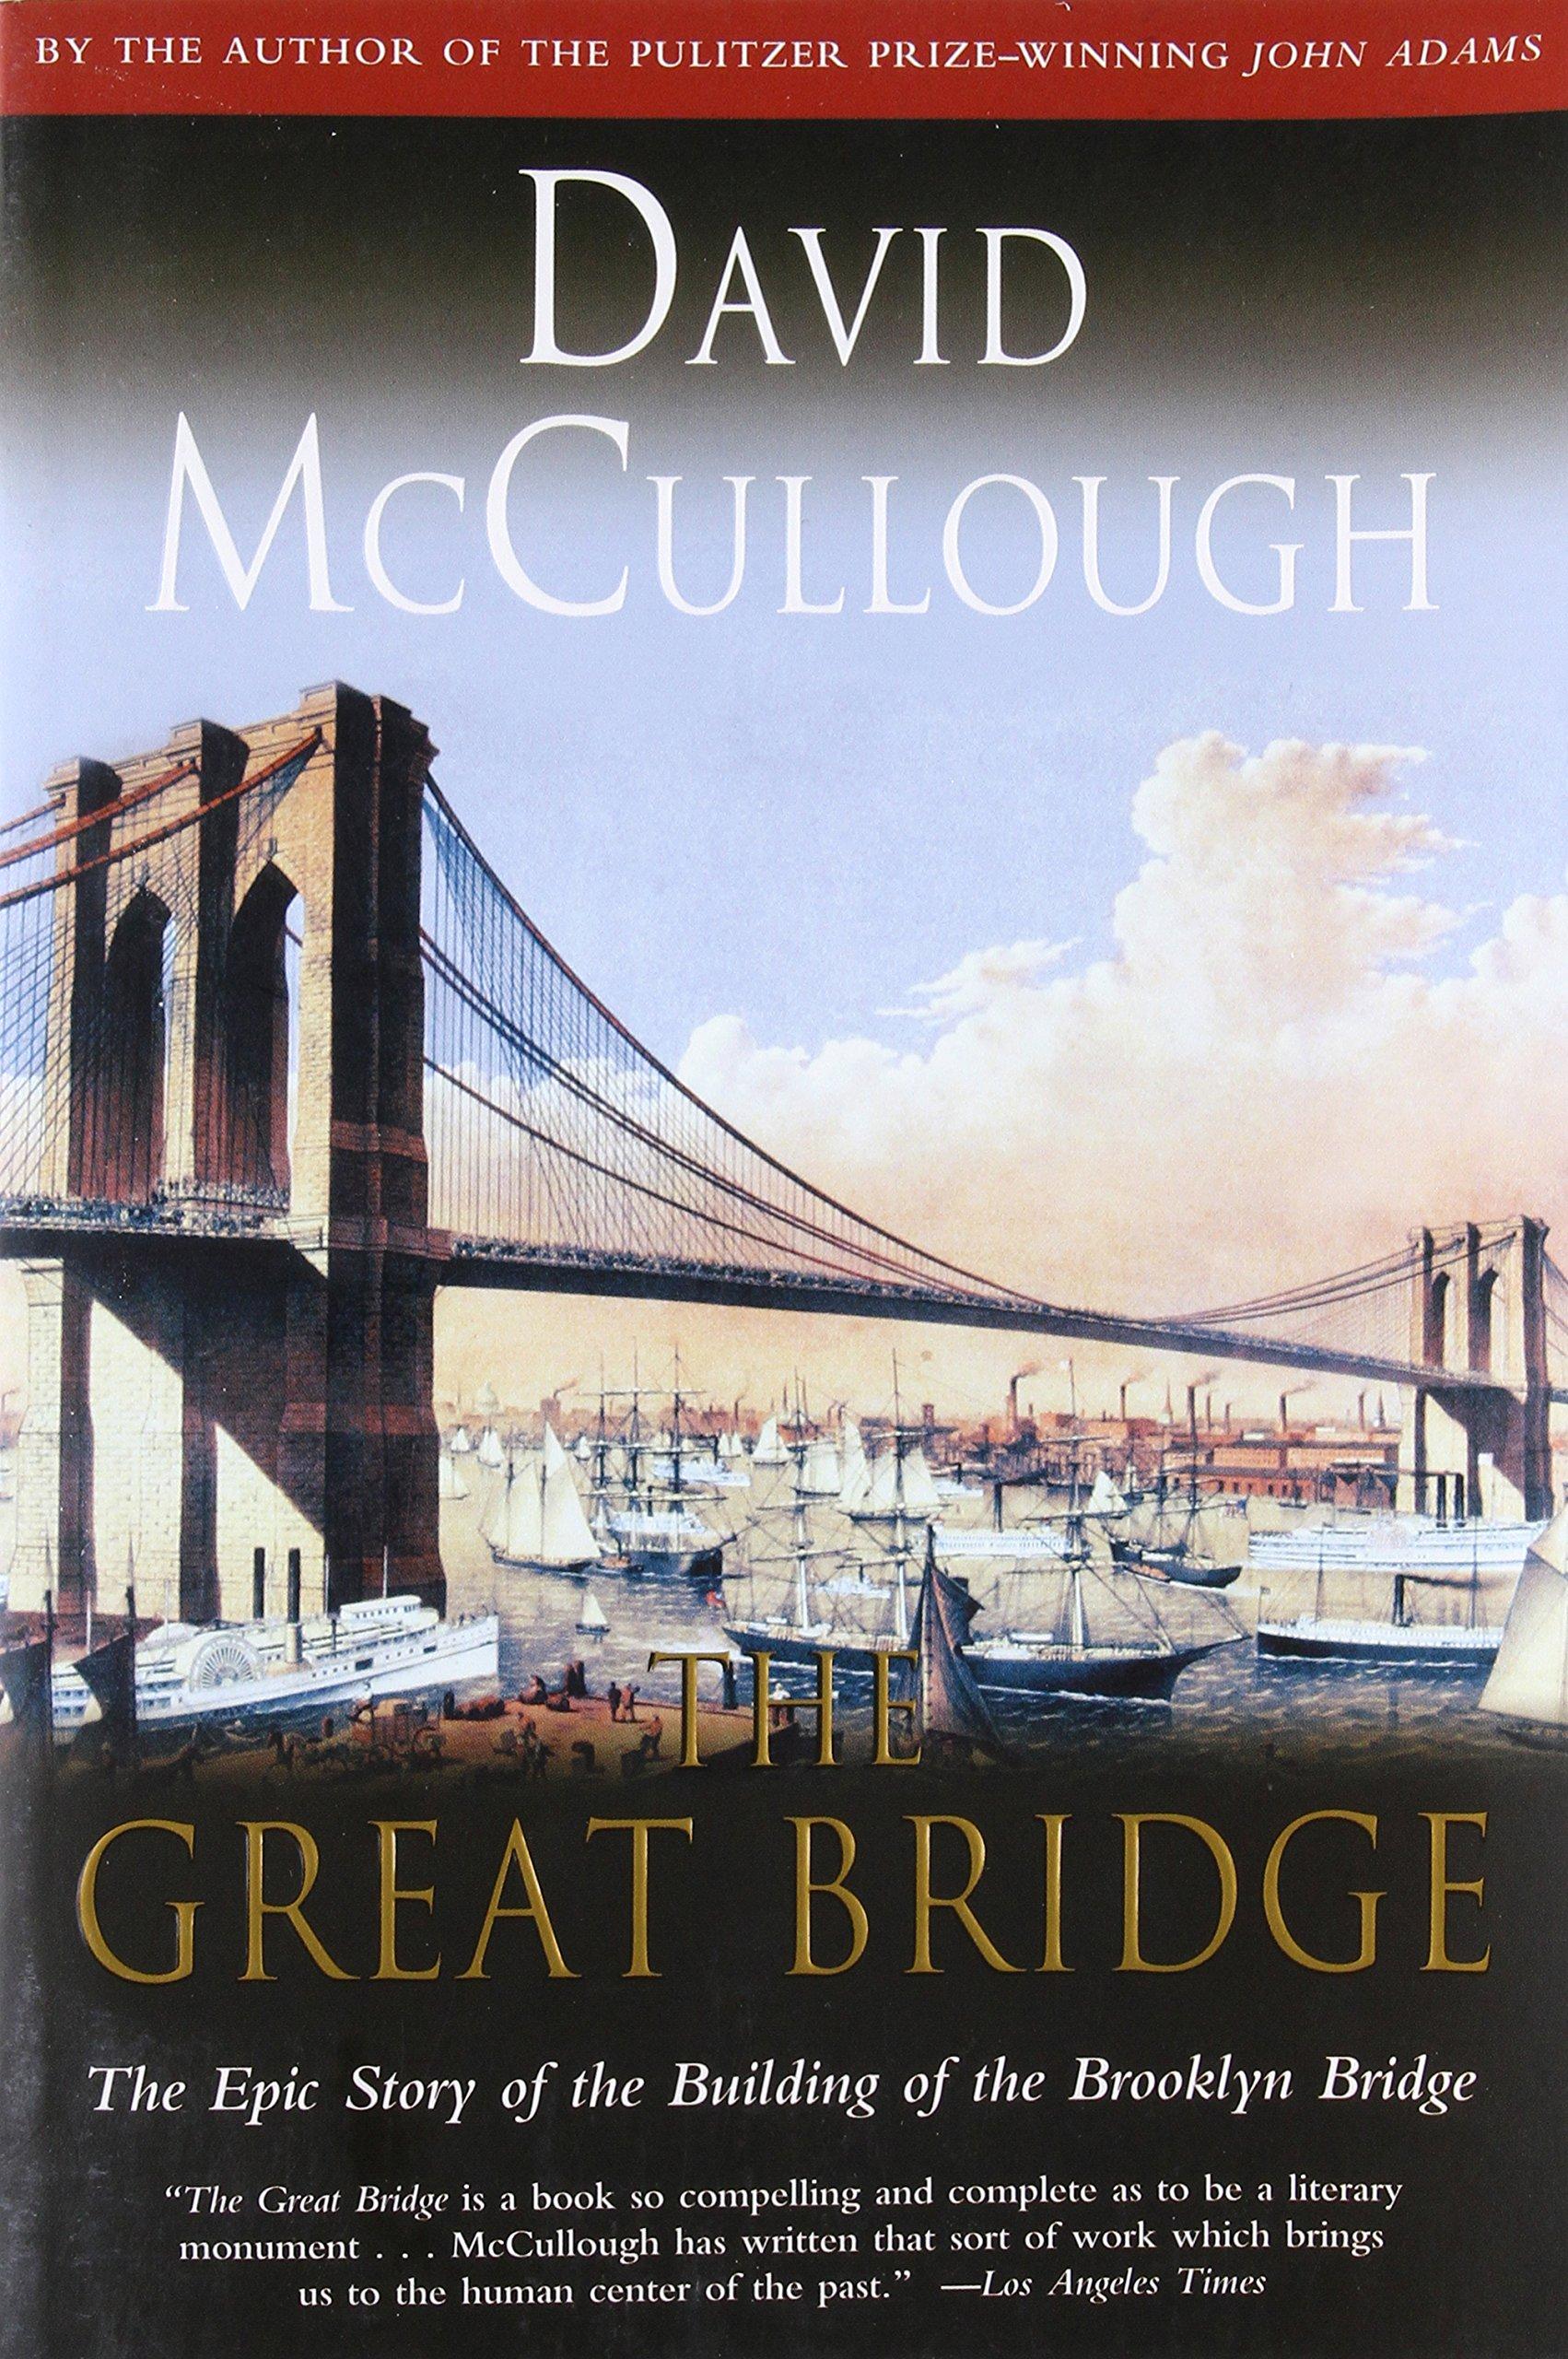 The Great Bridge The Epic Story Of The Building Of The Brooklyn Bridge Mccullough David 9780671457112 Amazon Com Books